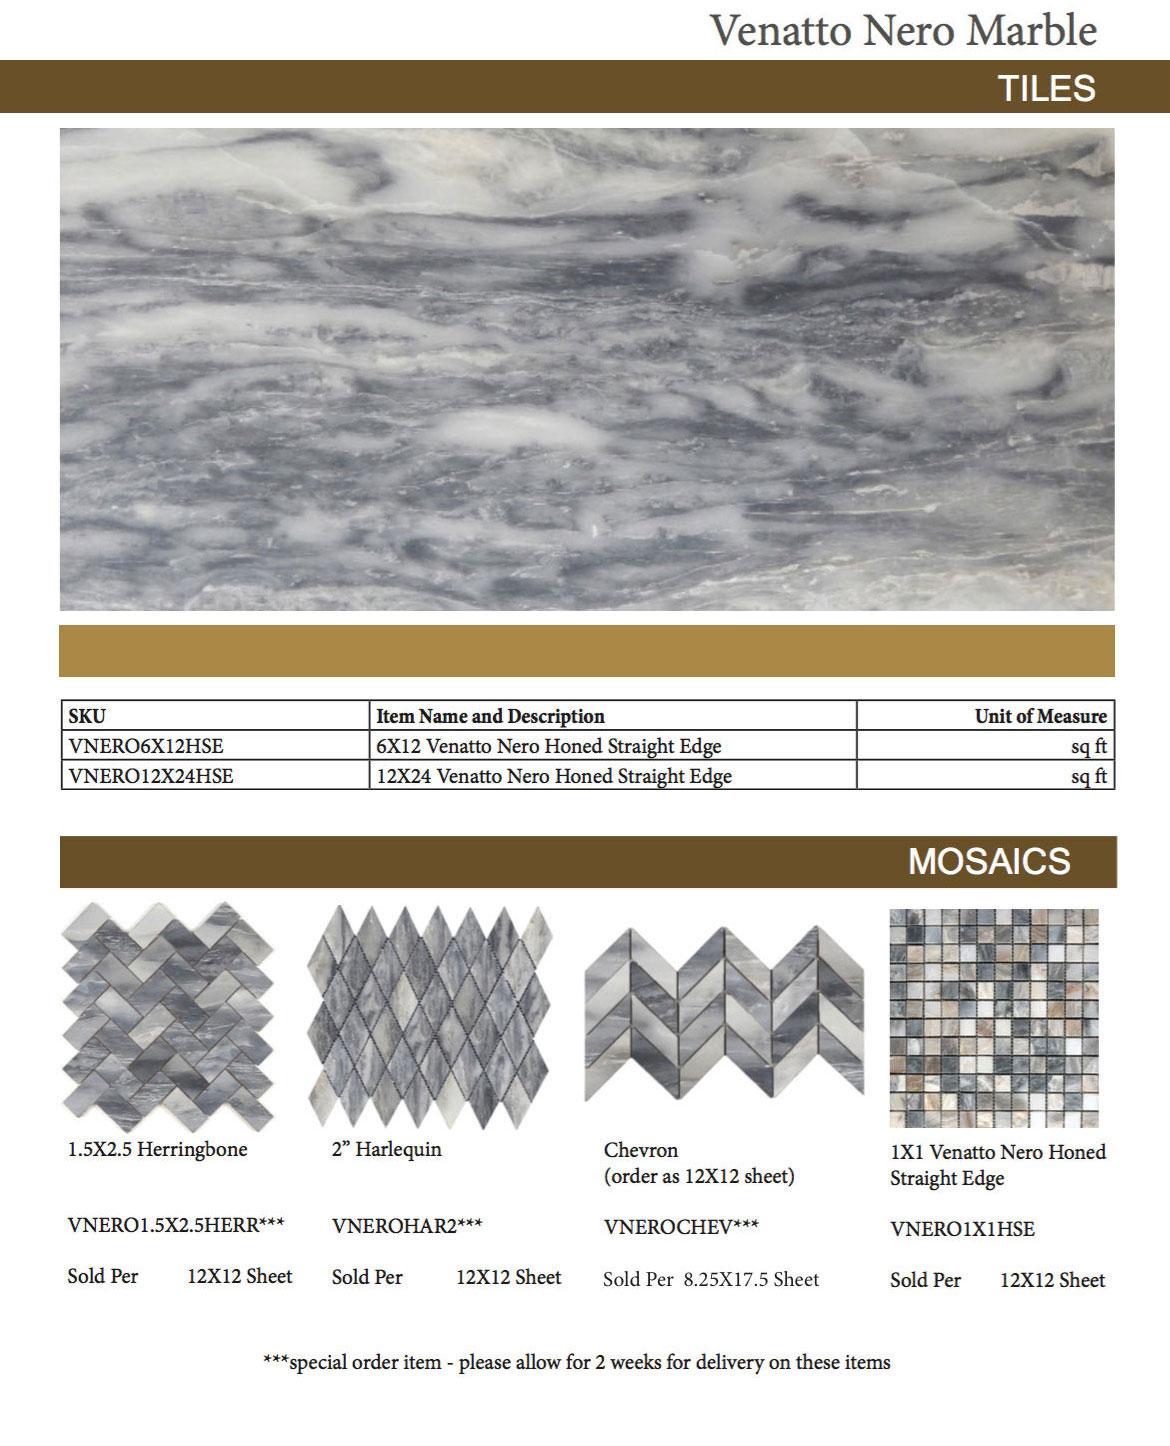 Venatto-Nero-Marble-Tiles